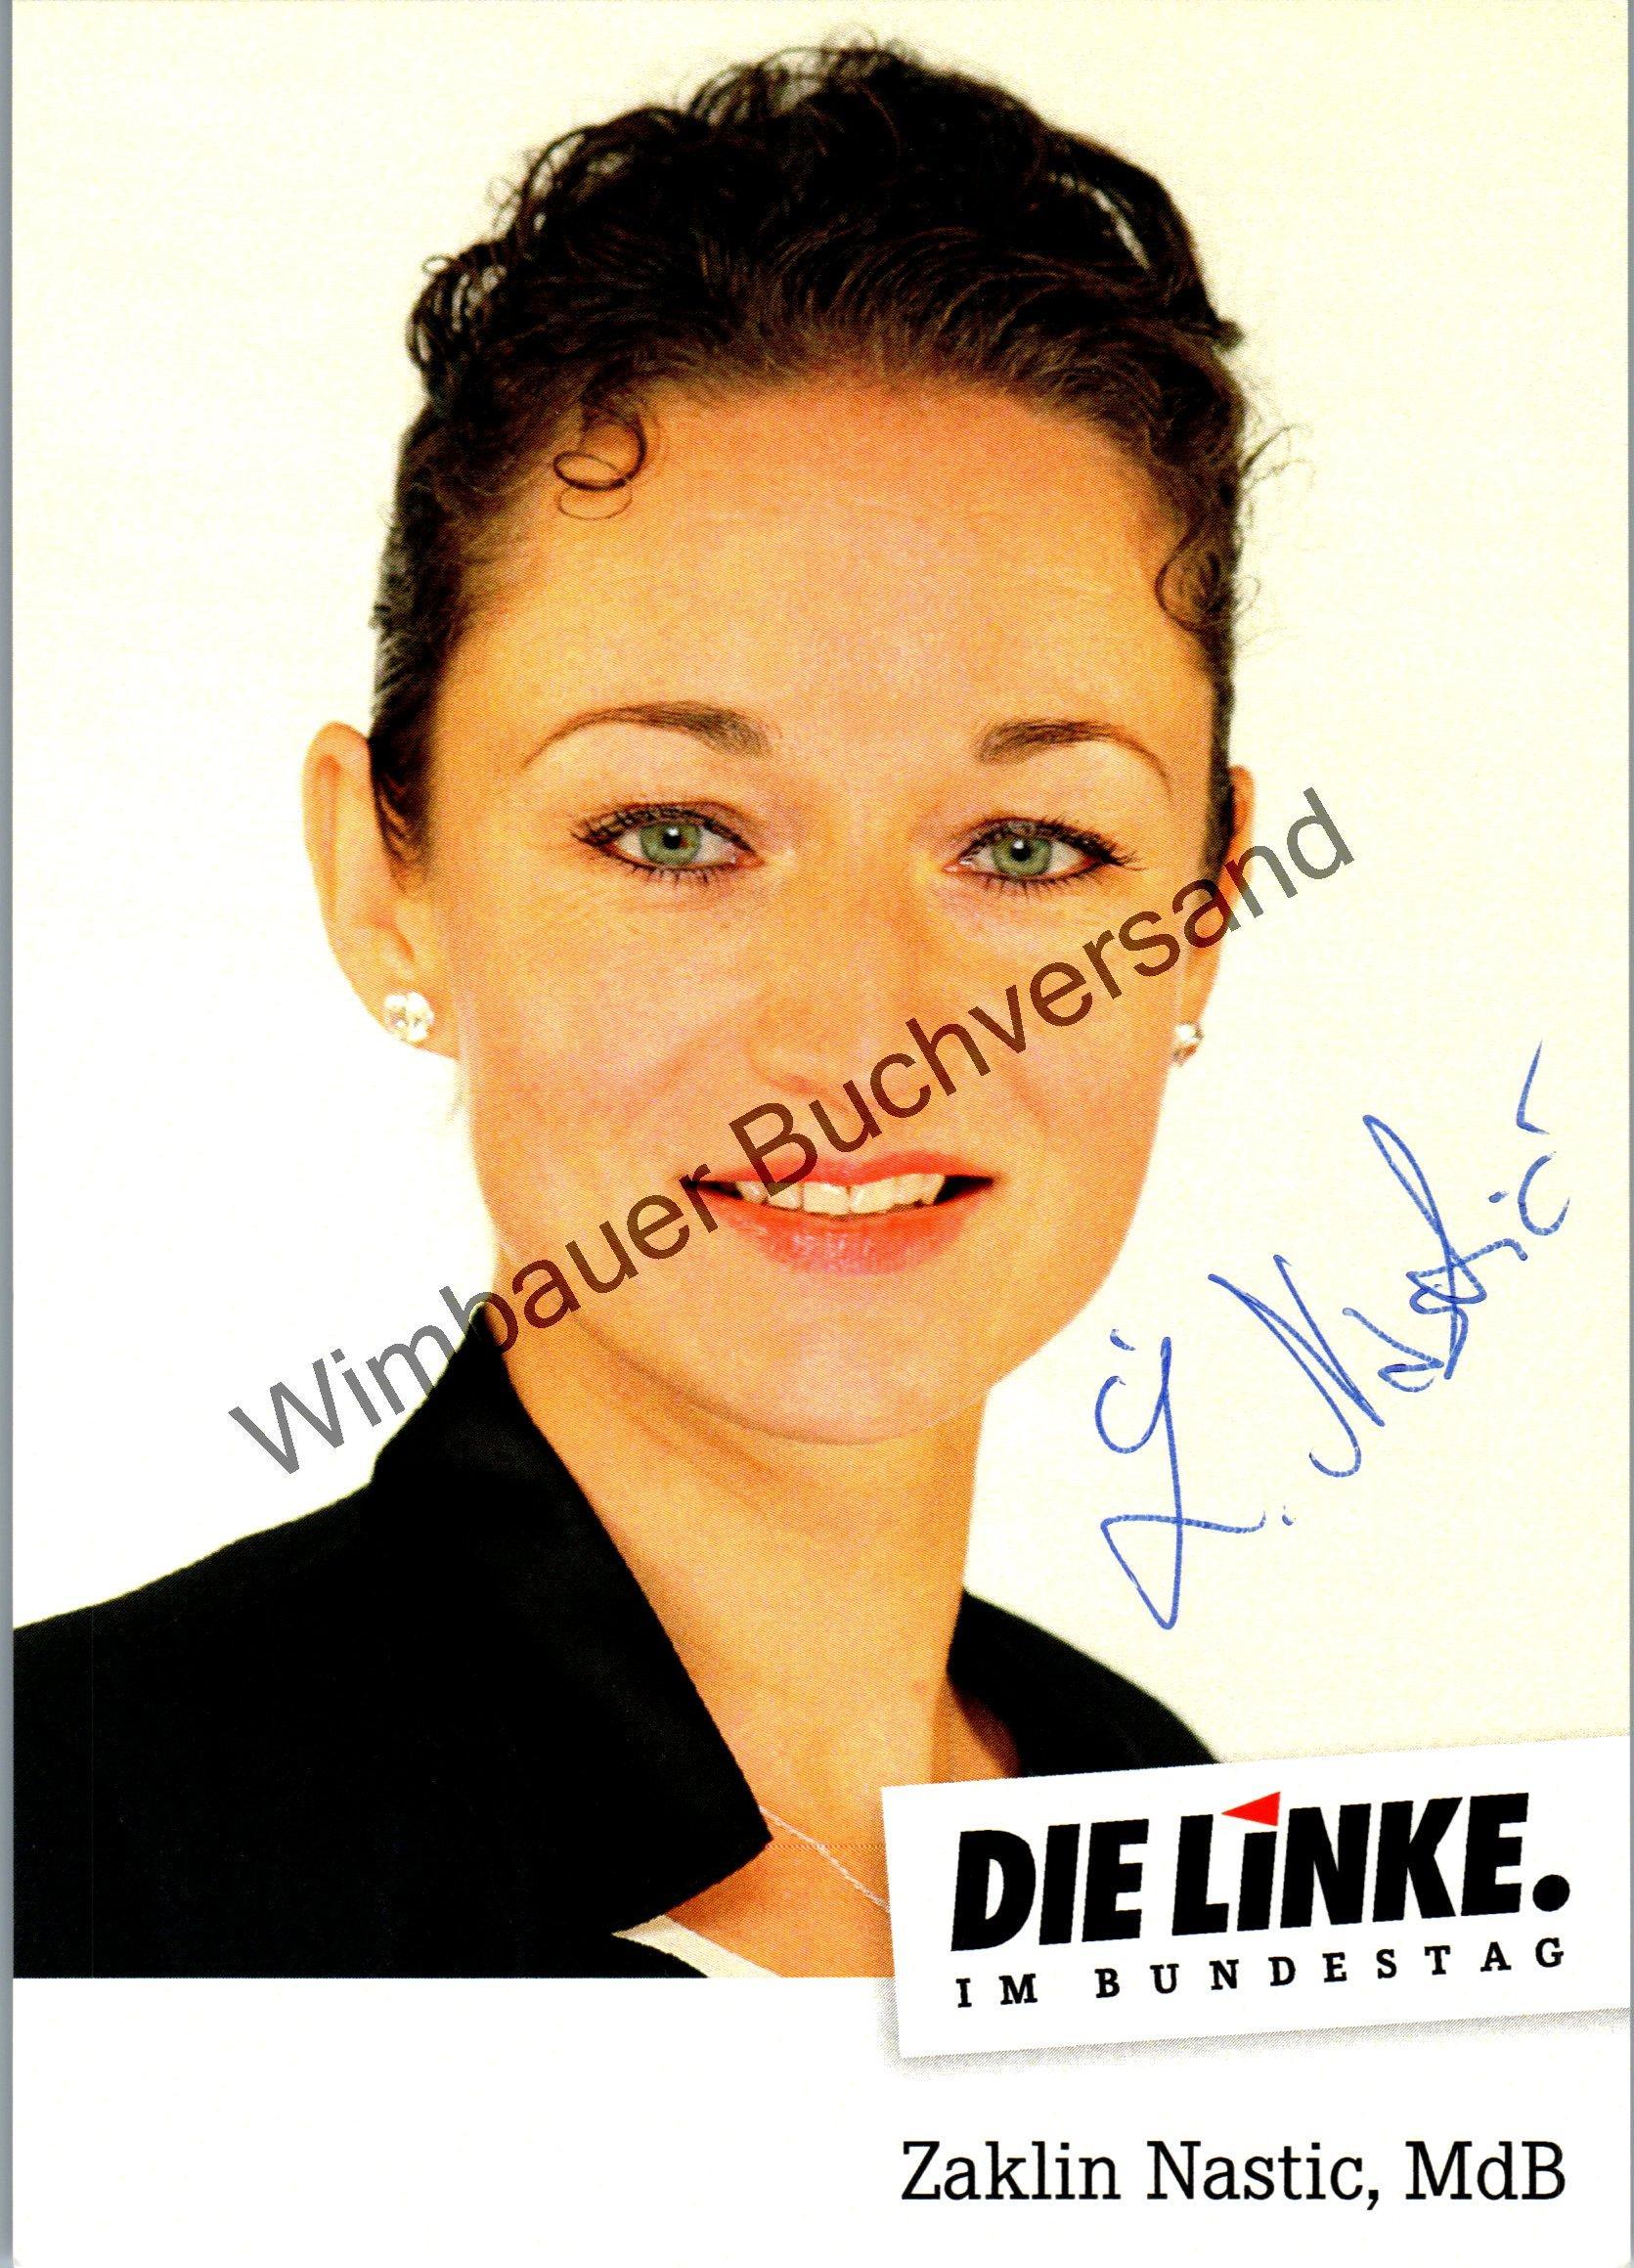 Nastic, Zaklin : Original Autogramm Zaklin Nastic MdB Die Linke /// Autogramm Autograph signiert signed signee